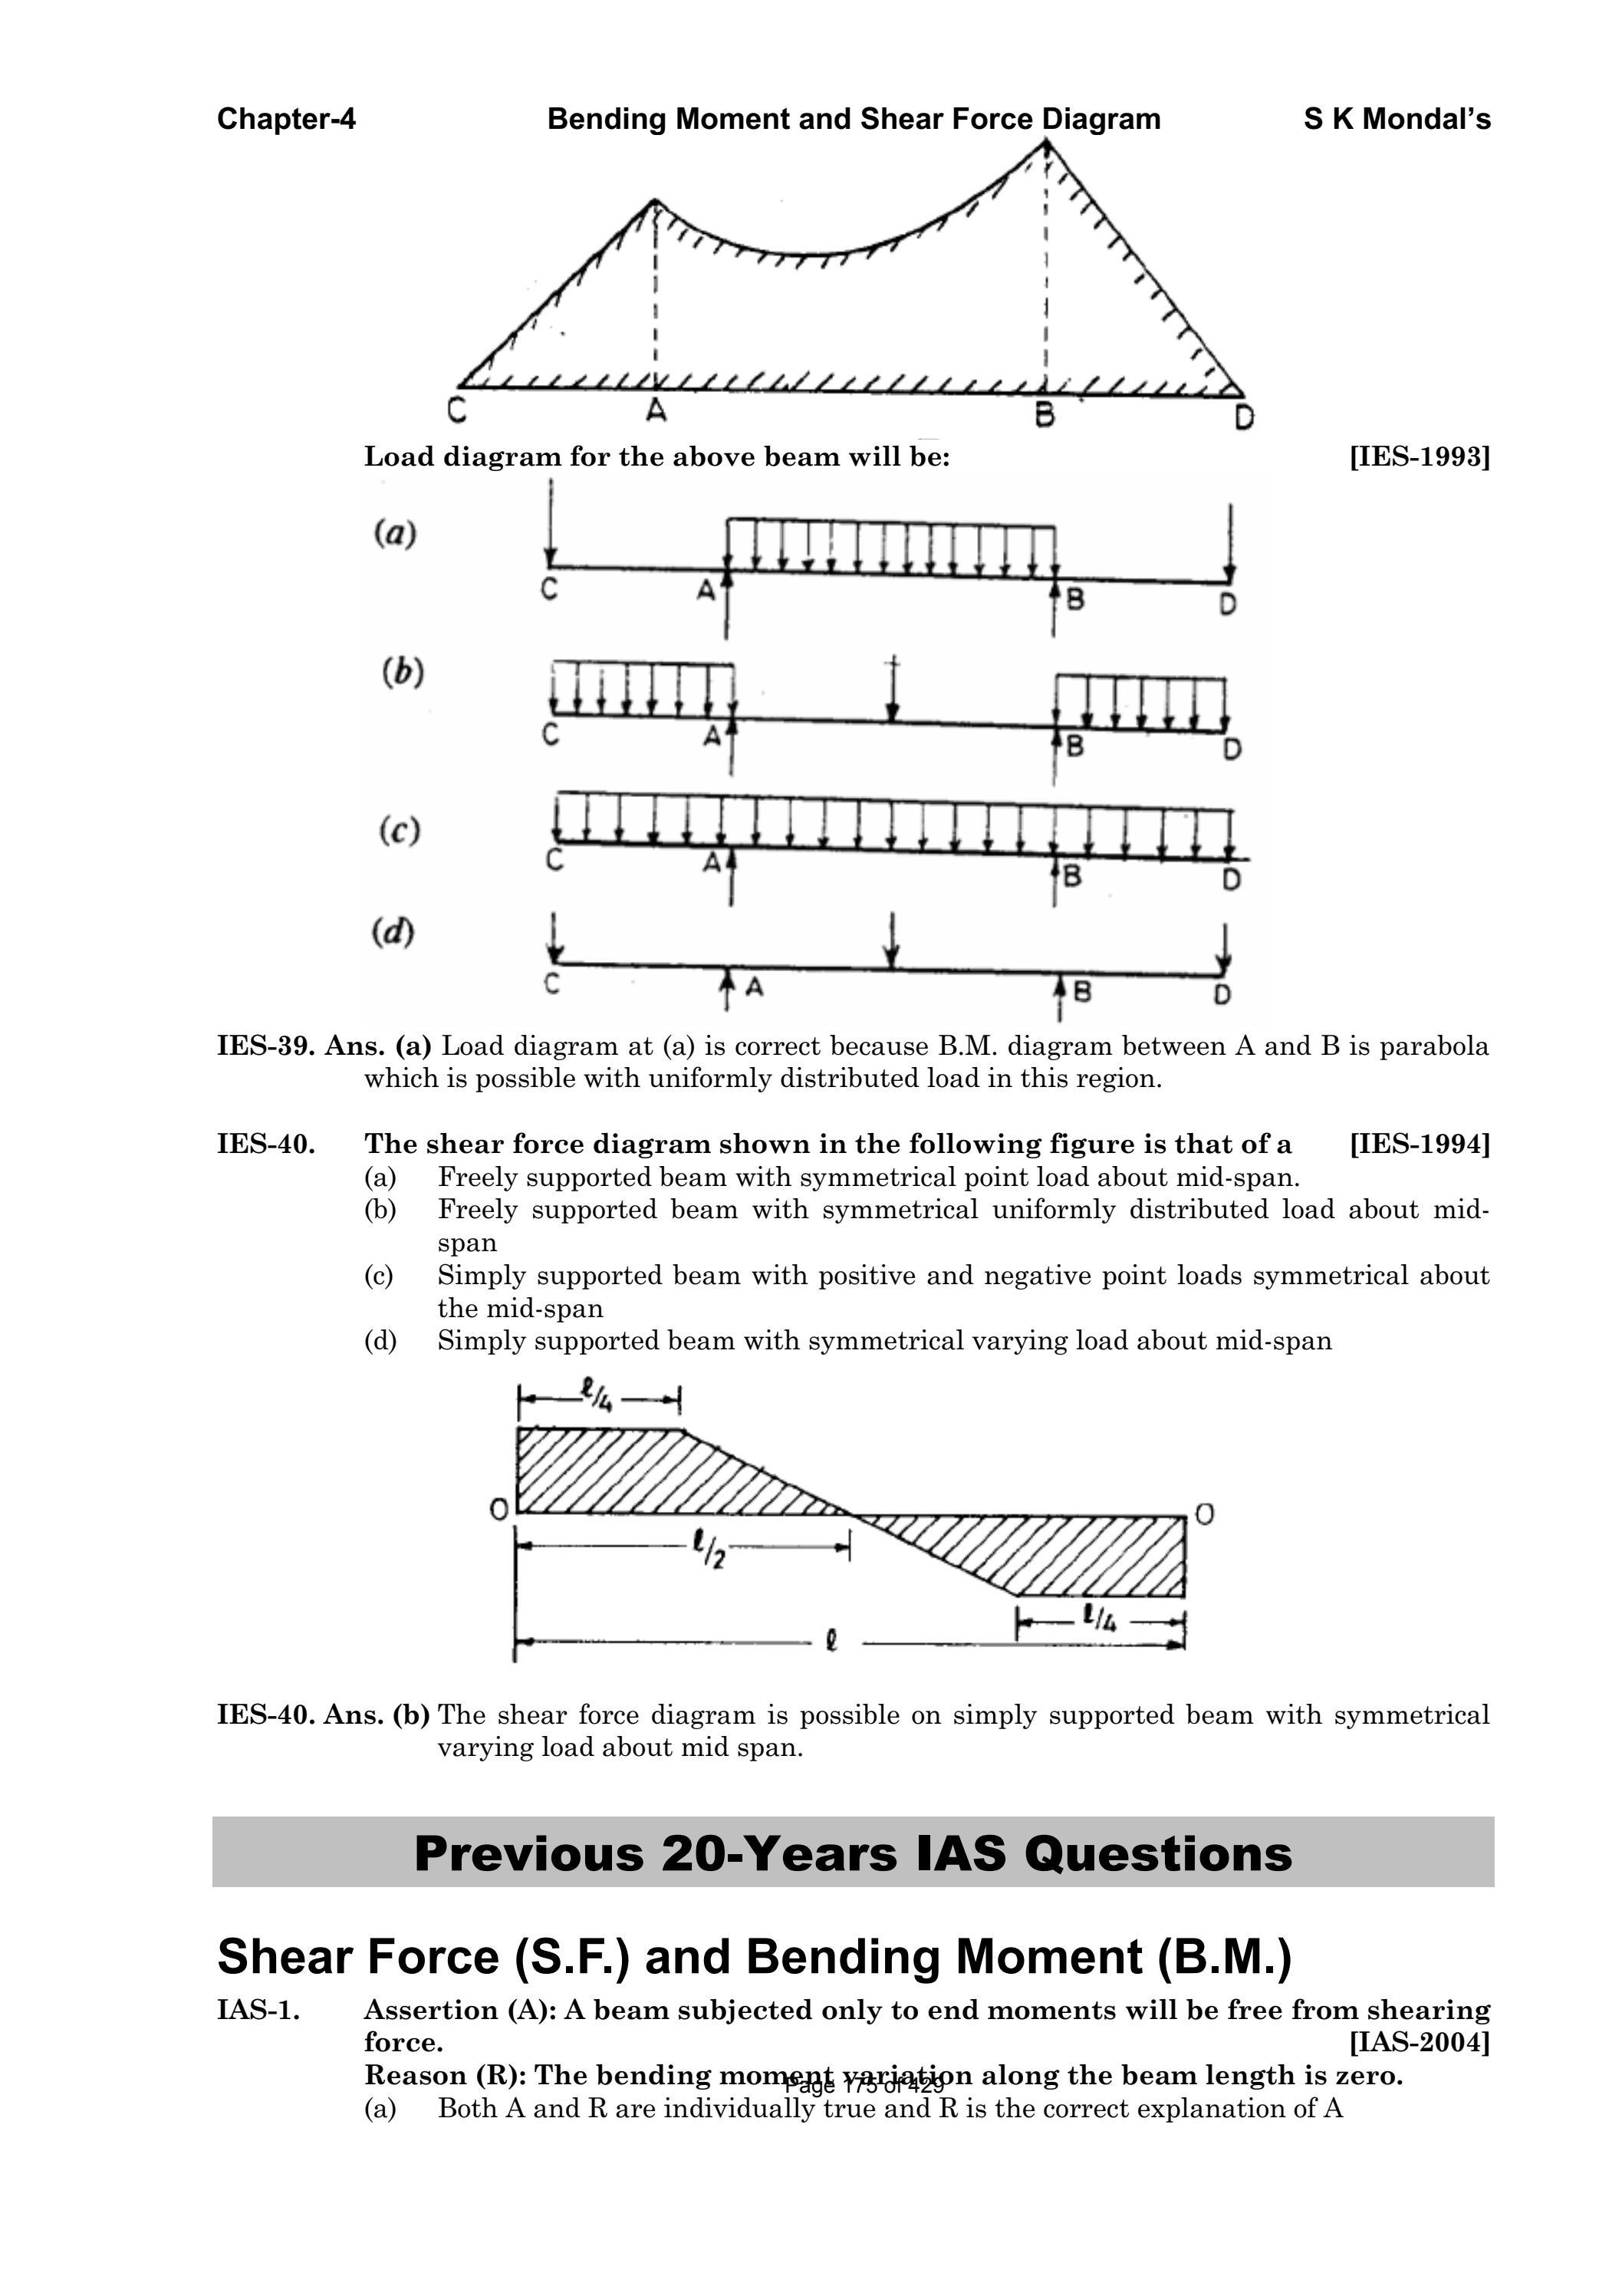 Strength Of Materials By S K Mondal Pdf Sdharmaraj Issuu Shear And Bending Diagrams